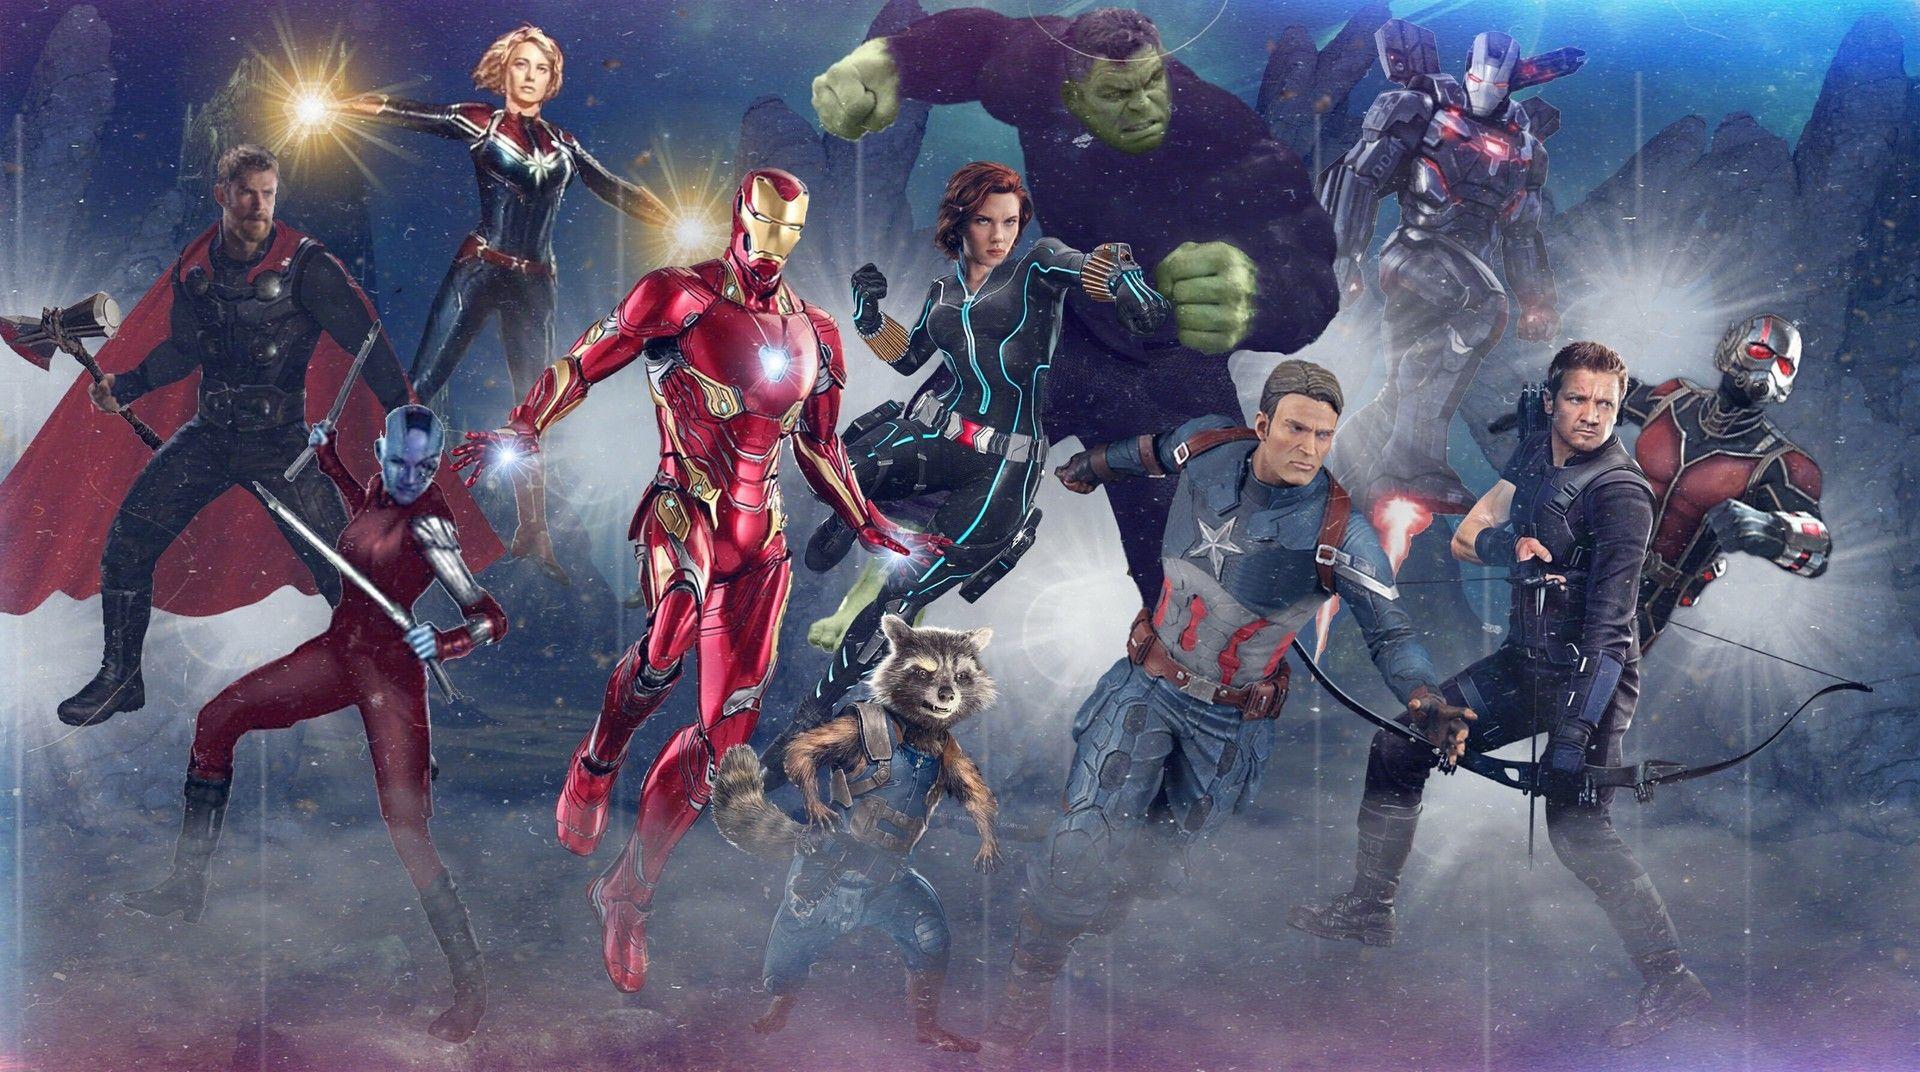 Avengers Assemble Wallpaper Hd Avengers 4 Concept Art Avengers Pinterest